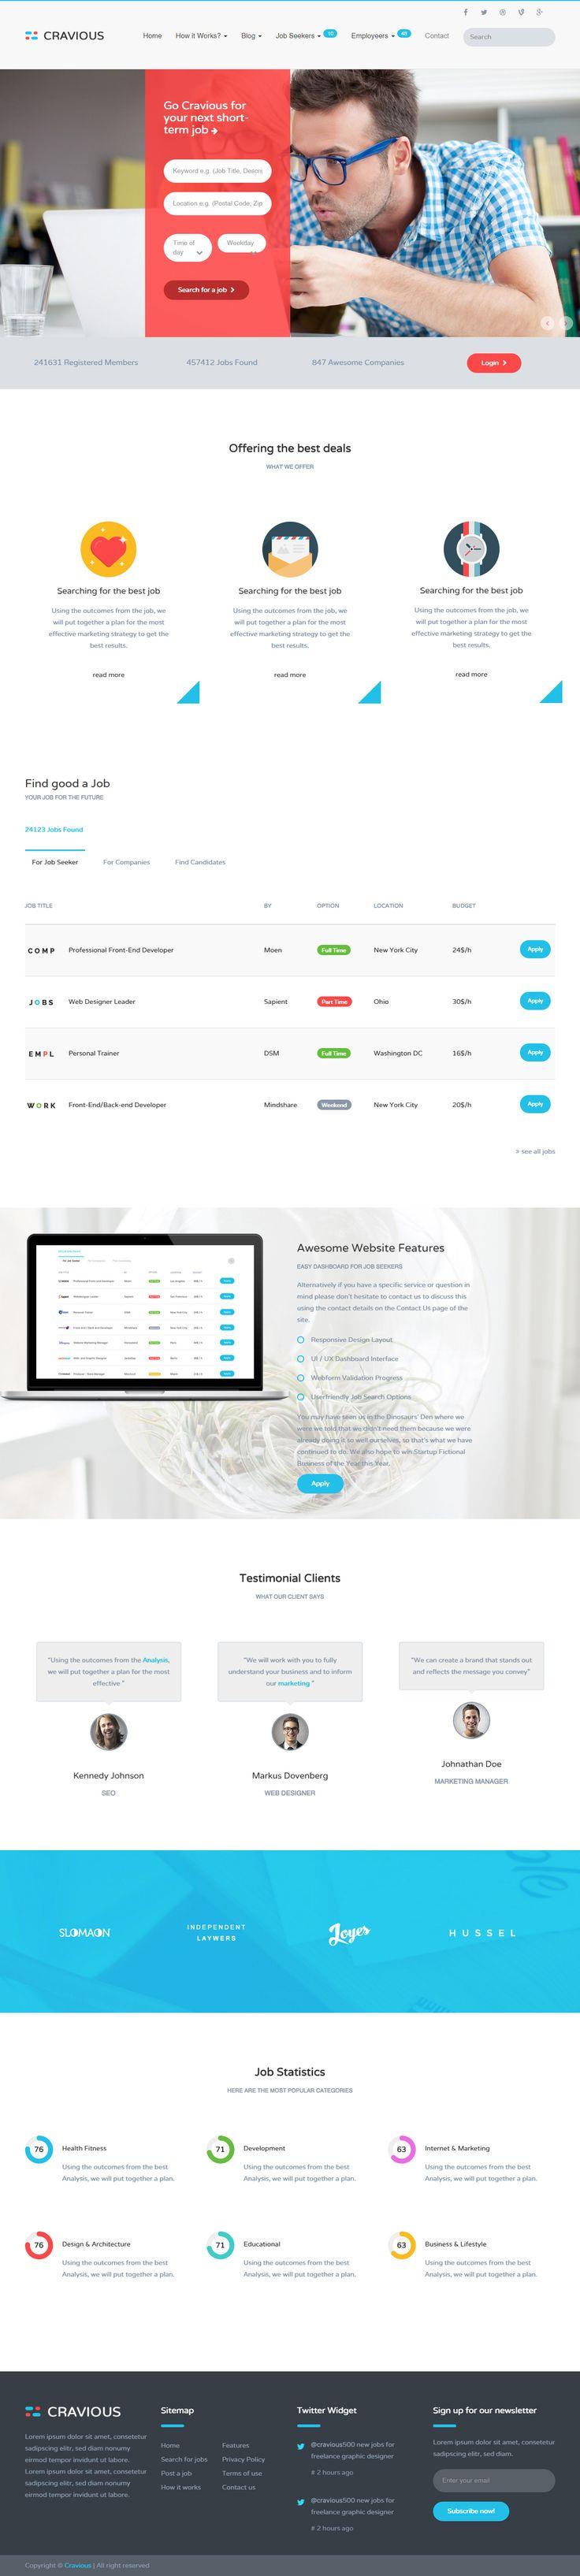 best ideas about job portal website layout food cravious is premium responsive retina template bootstrap 3 framework seo friendly google fonts test demo at